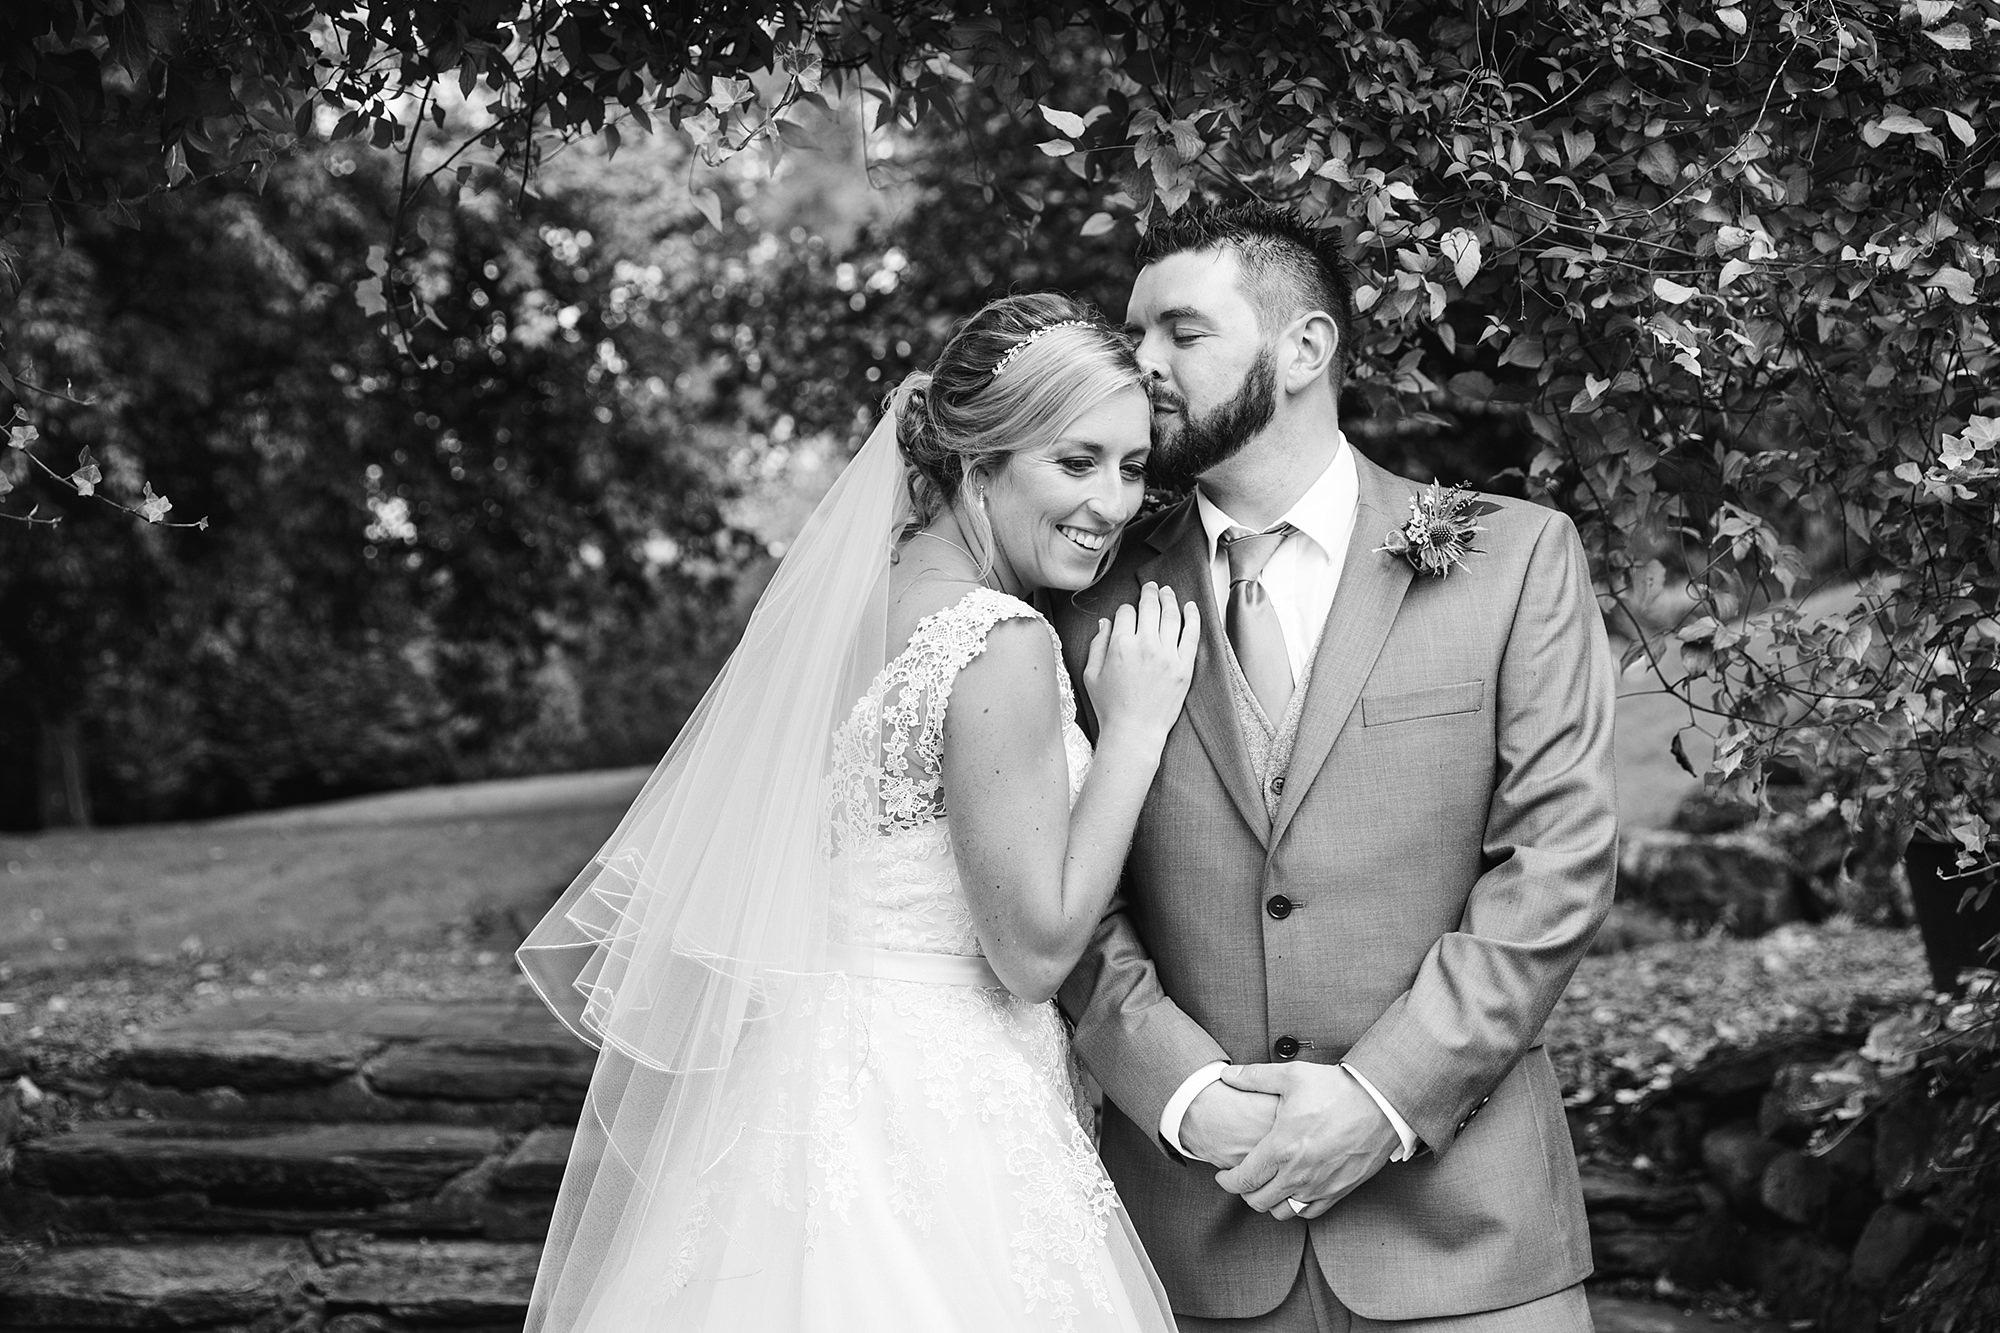 A fun wedding at Plas Isaf - portrait of groom kissing bride